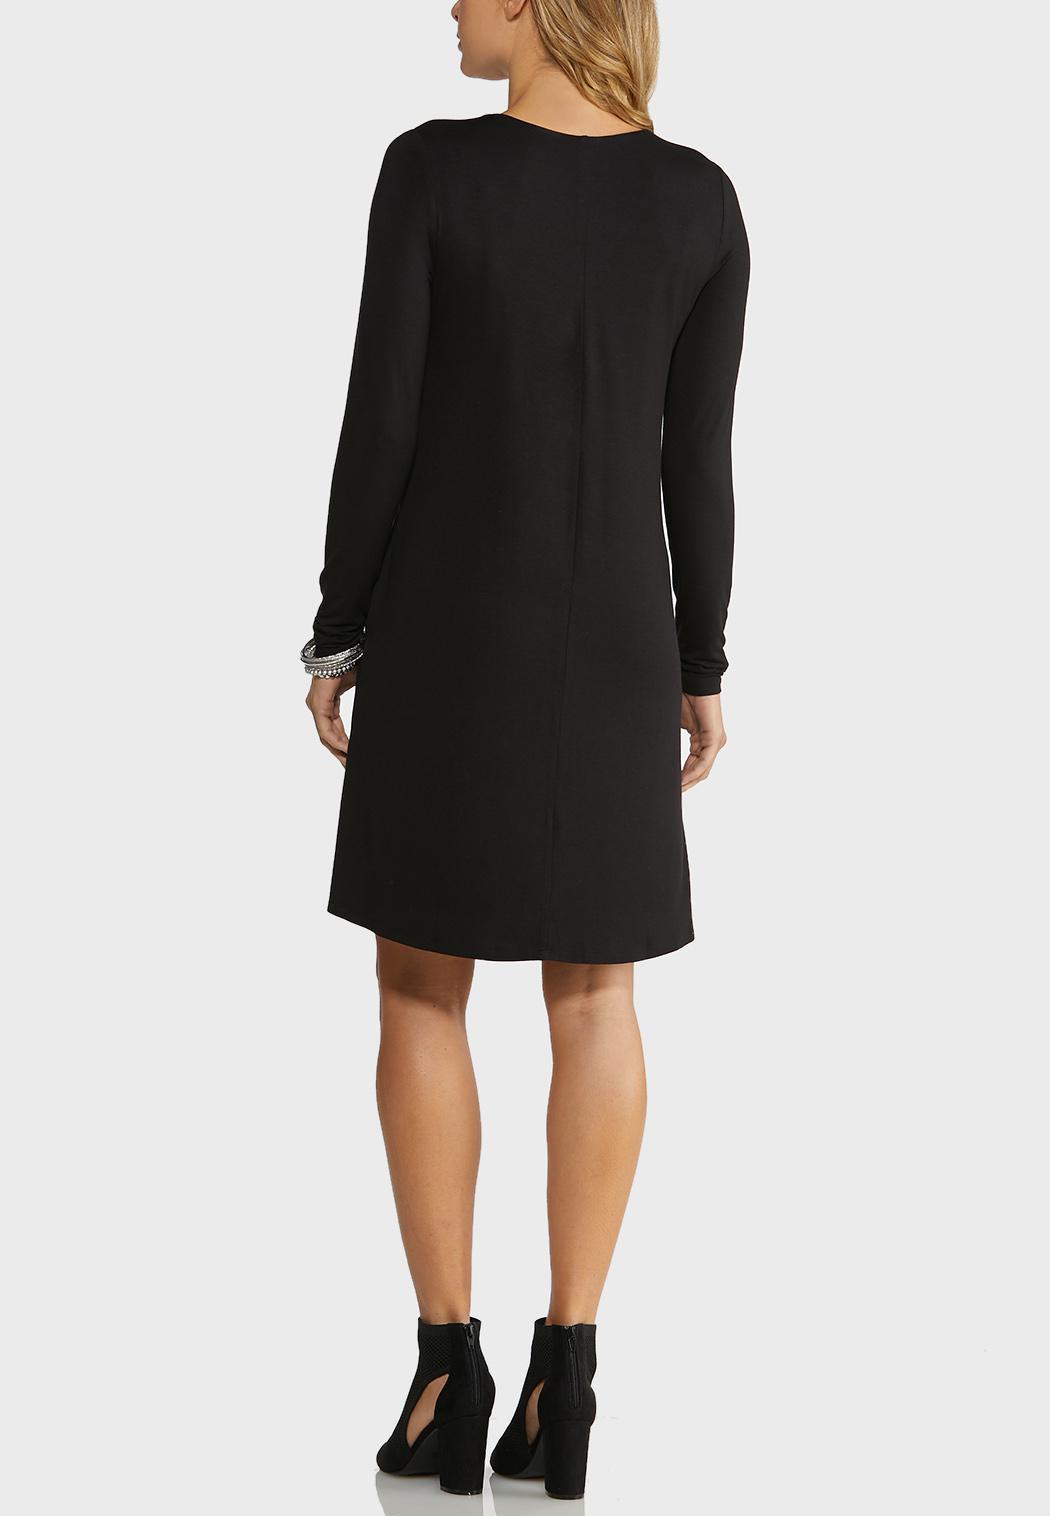 Plus Size Comfy Solid Swing Dress (Item #43979381)